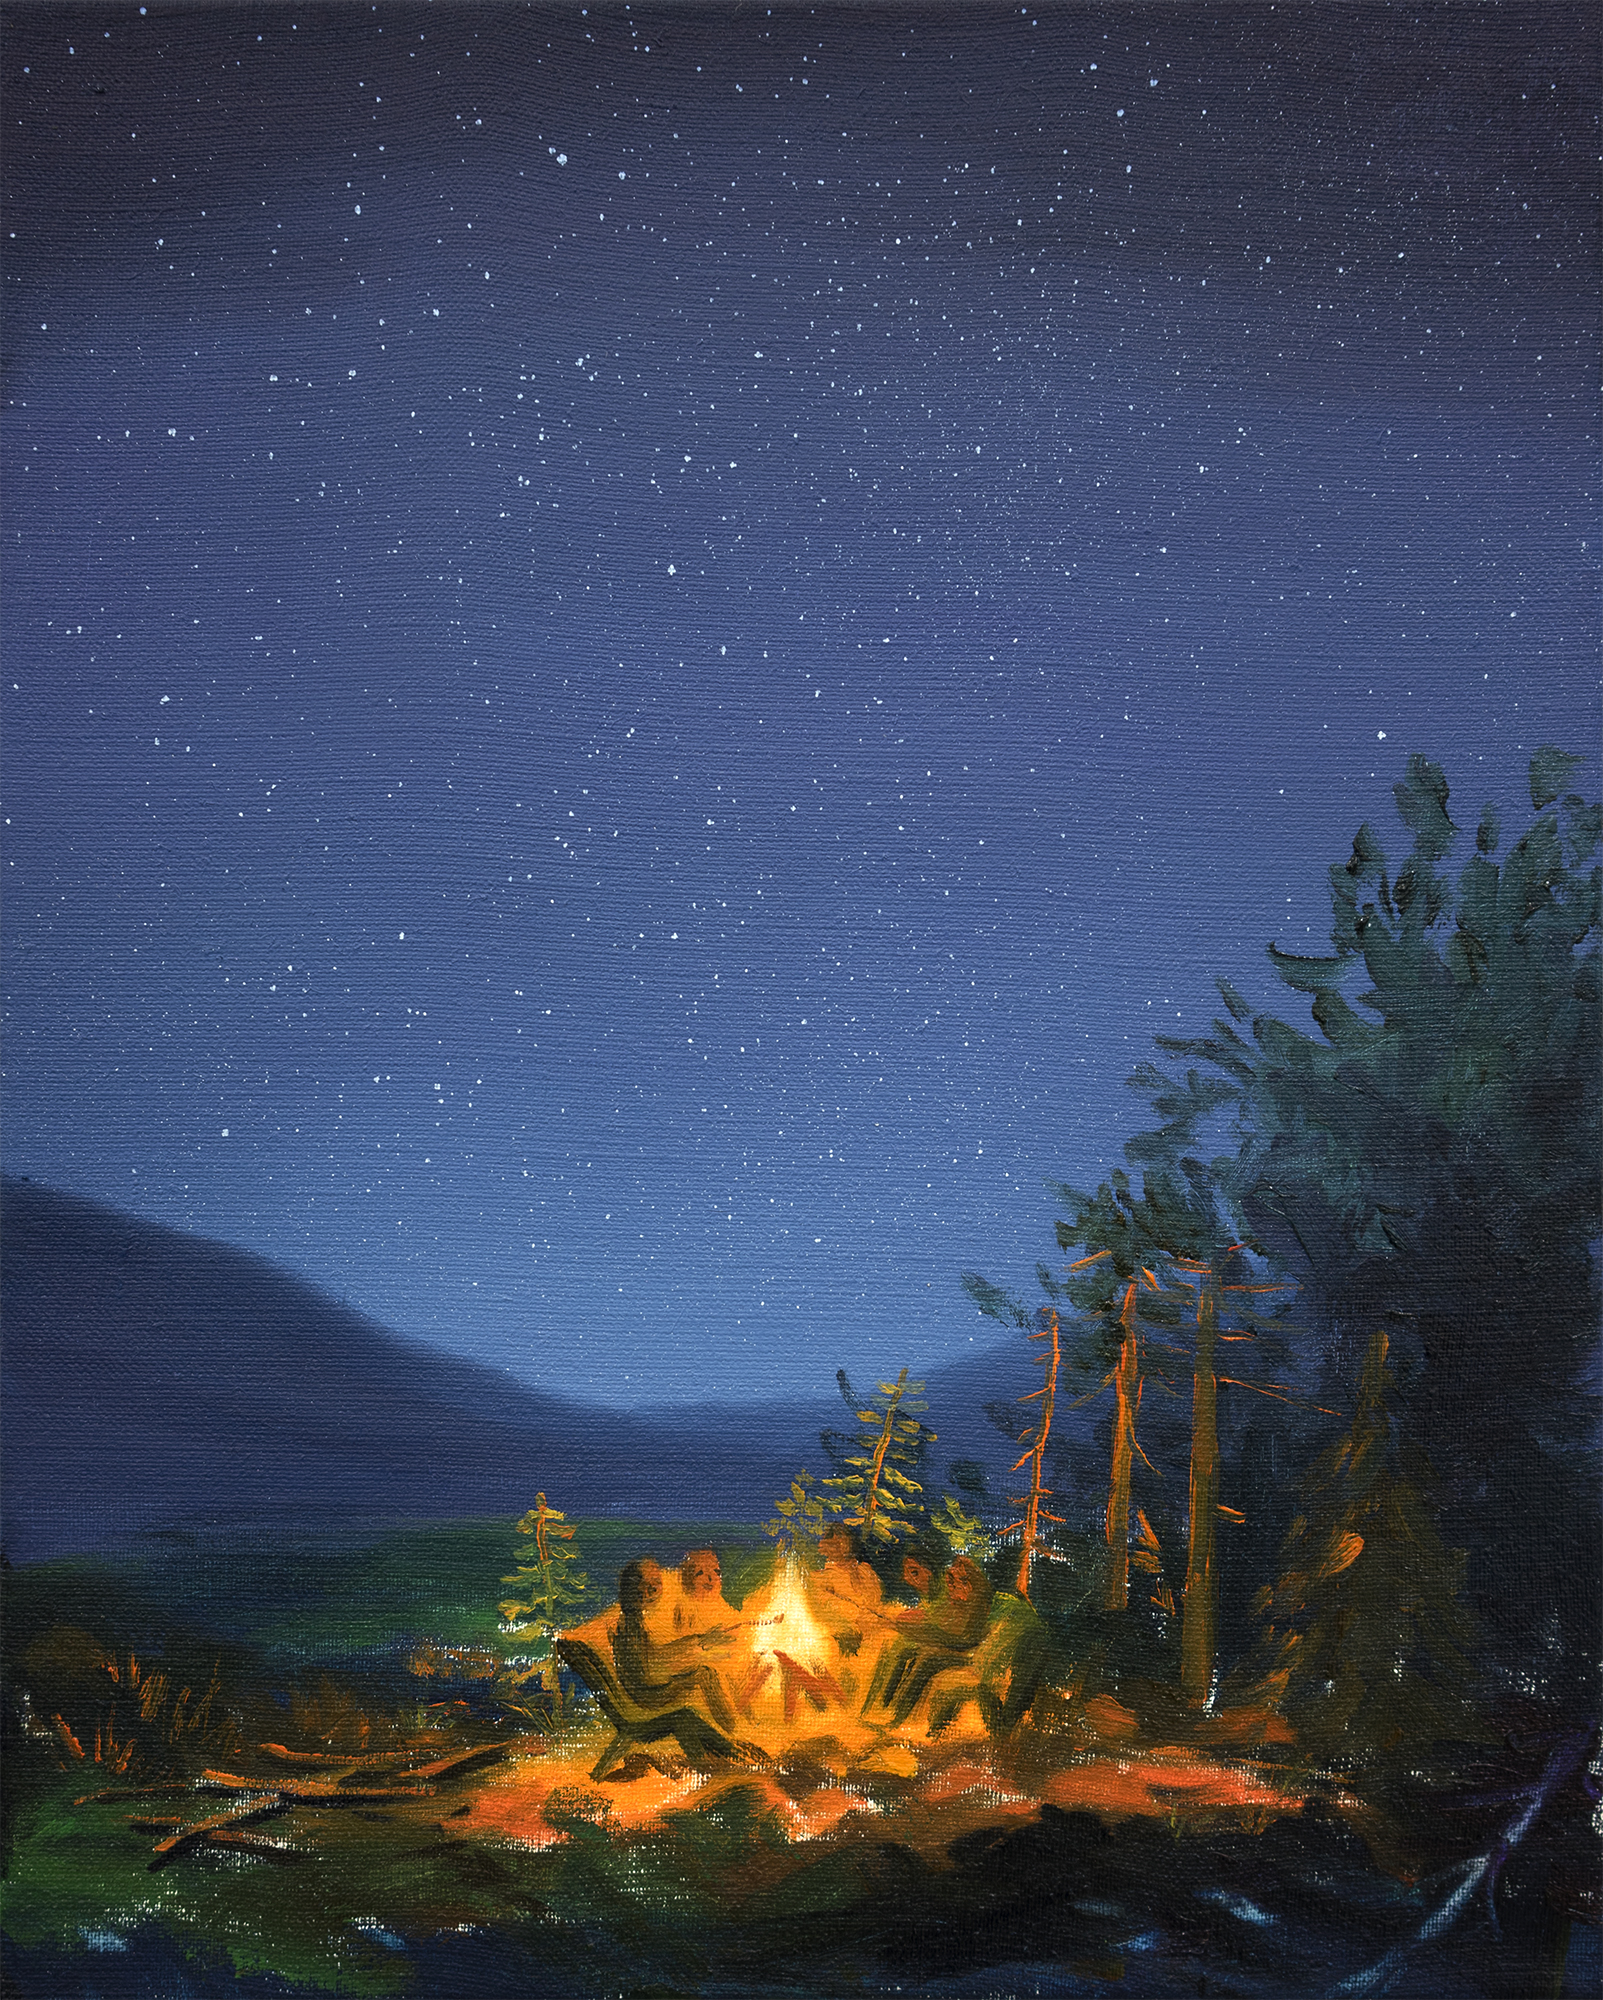 Campfire, 2018